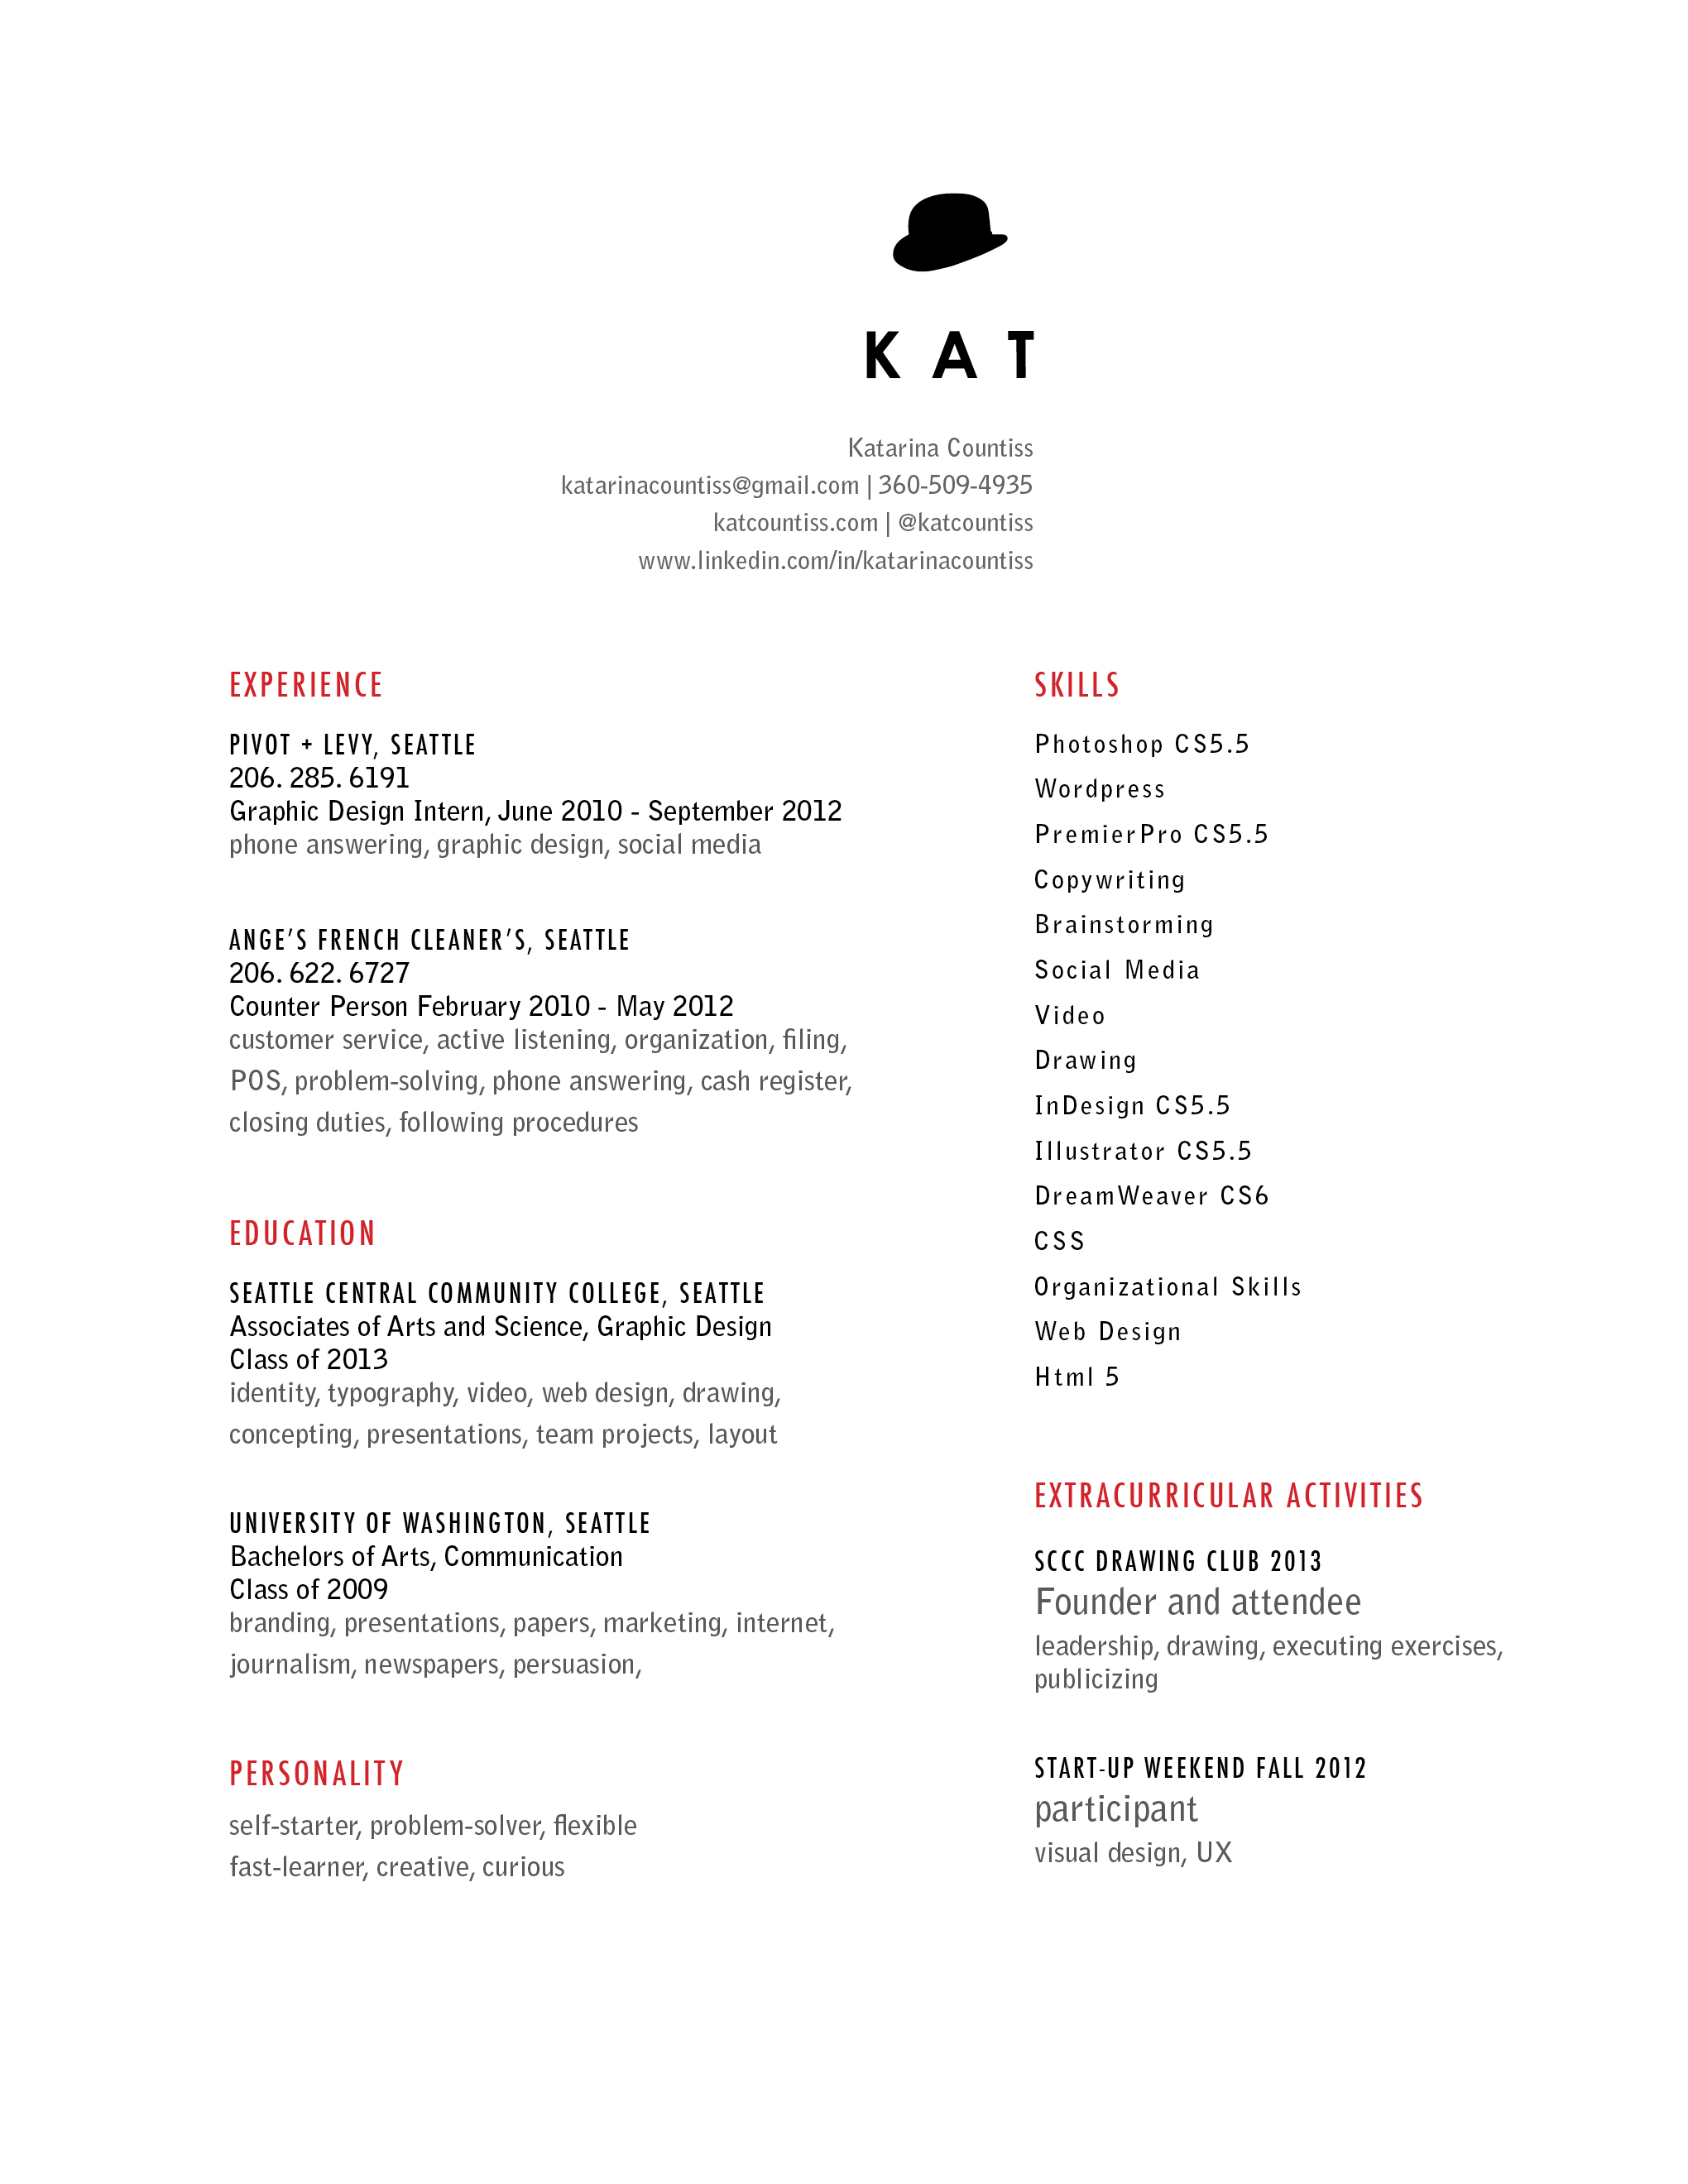 Typesetting My Resume Katablog